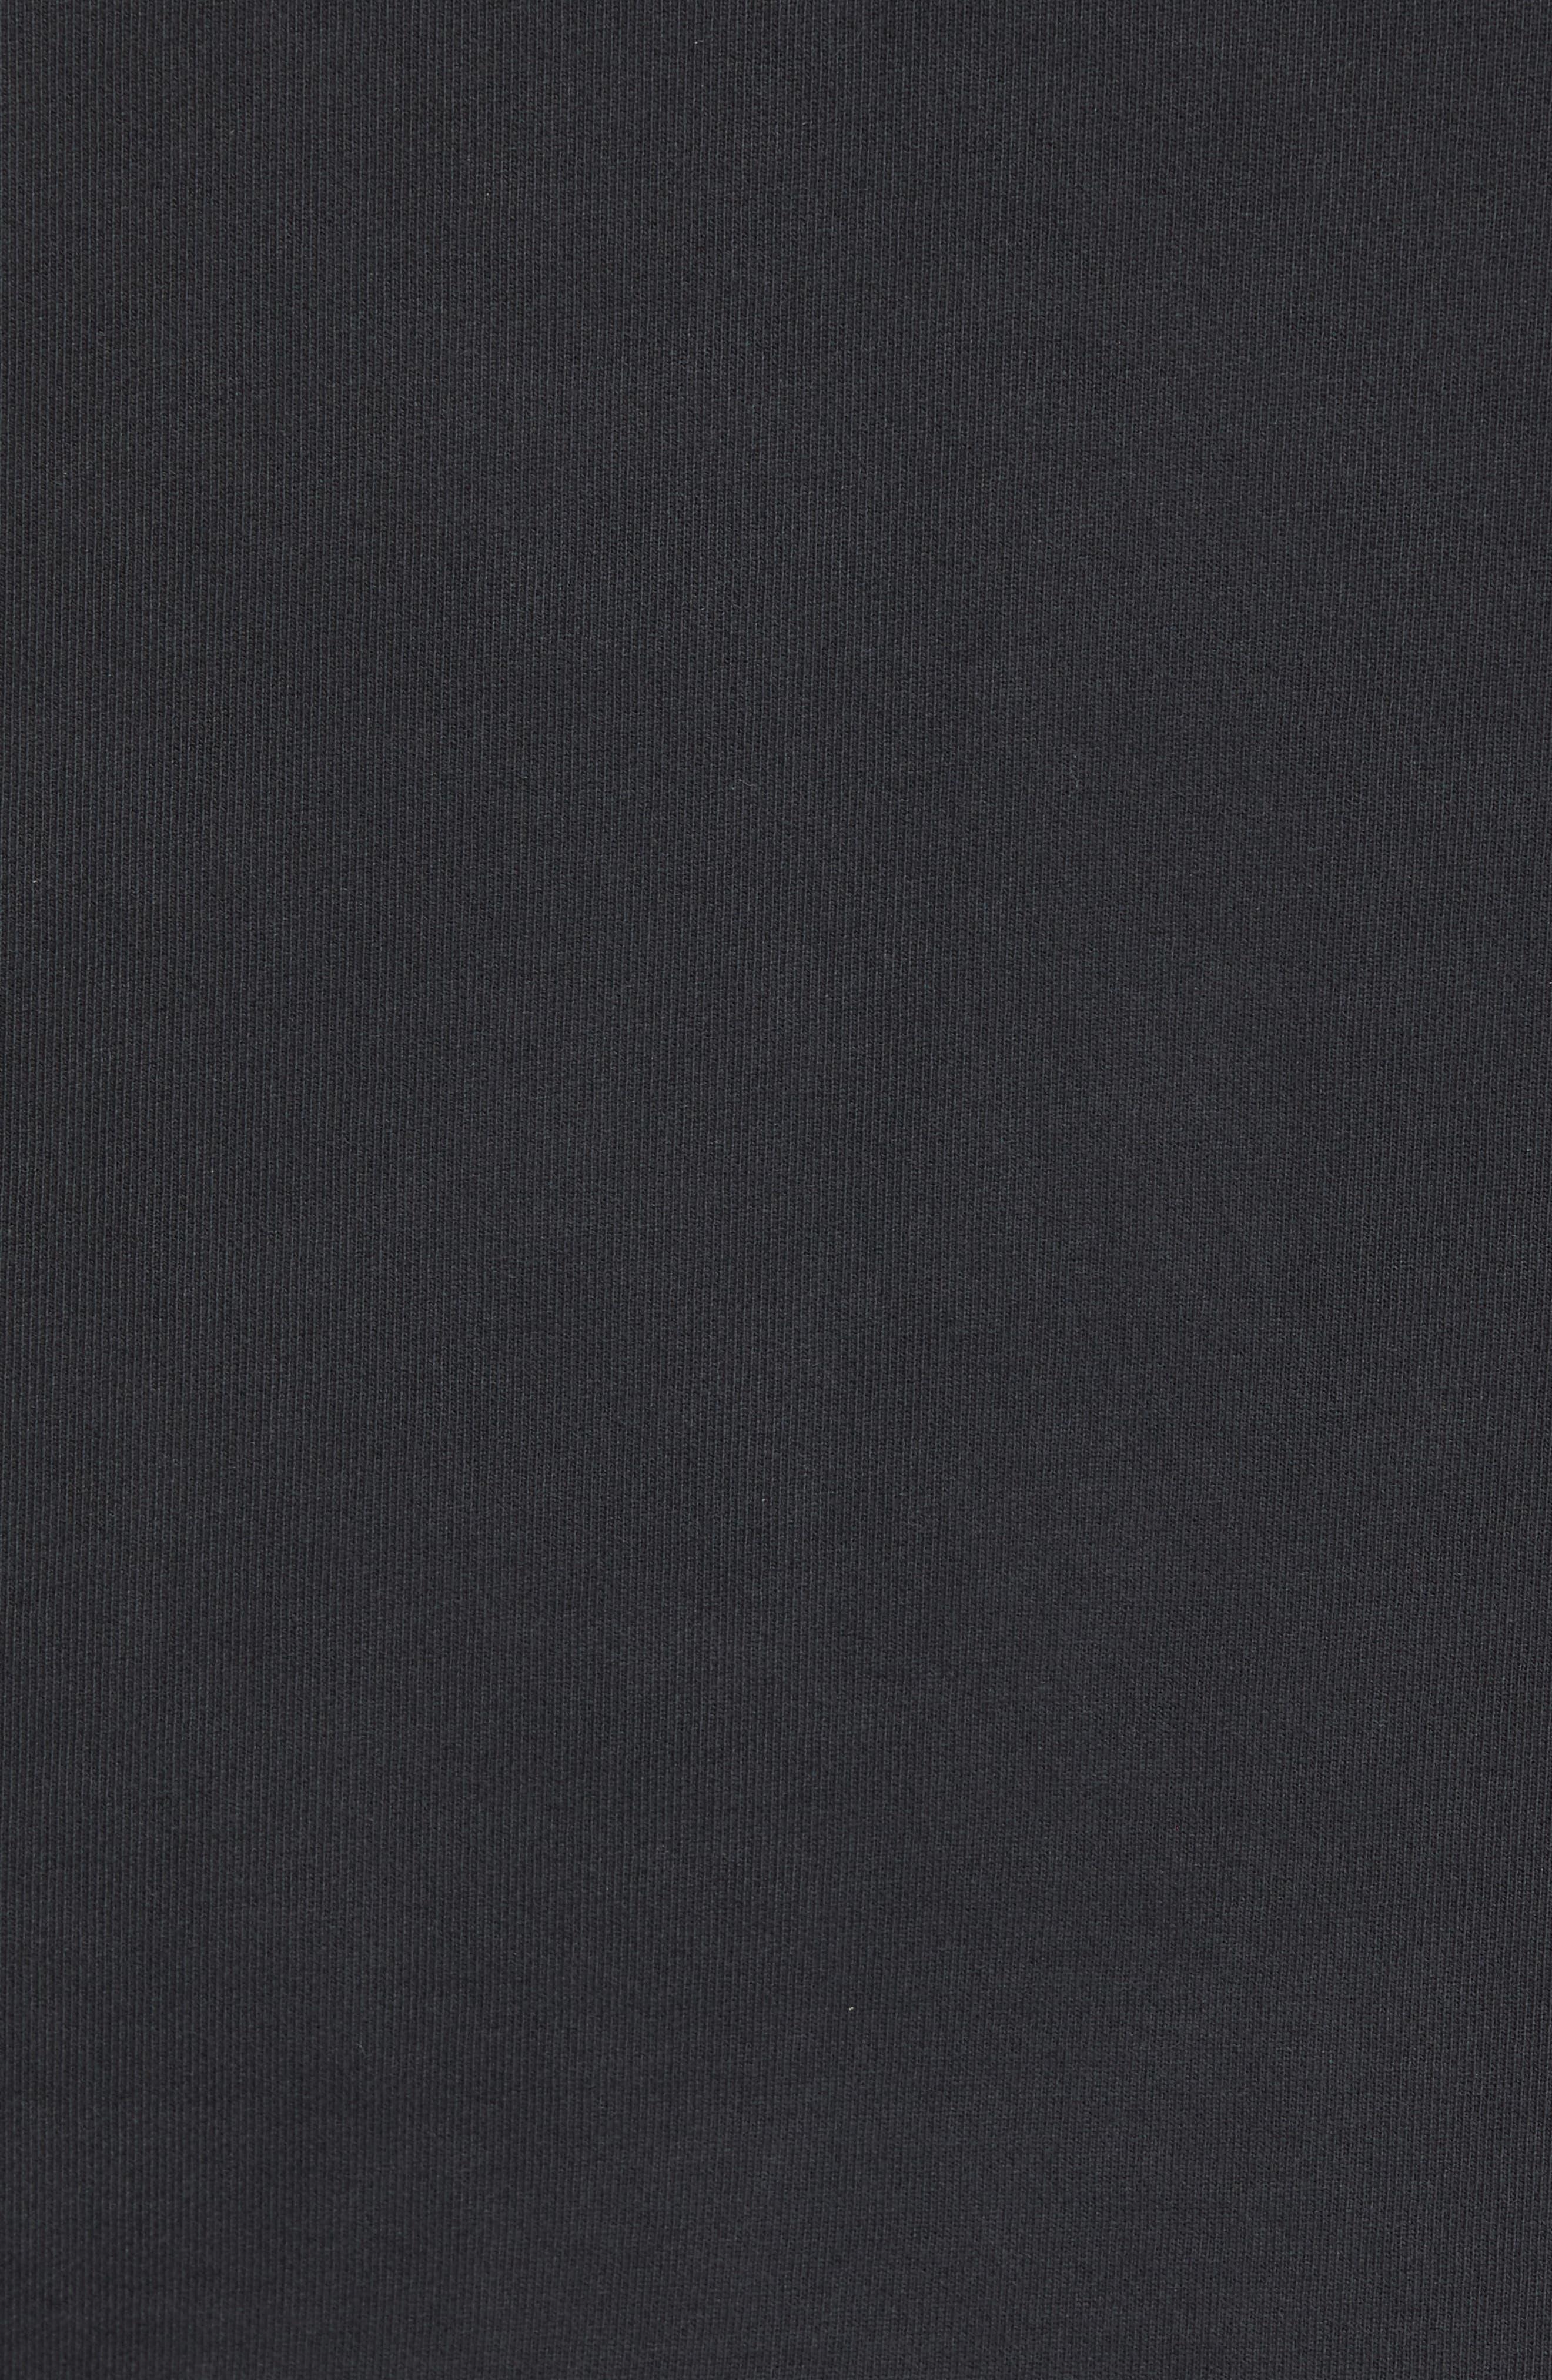 John Varvatos x Nick Jonas Rock City Hoodie,                             Alternate thumbnail 5, color,                             BLACK